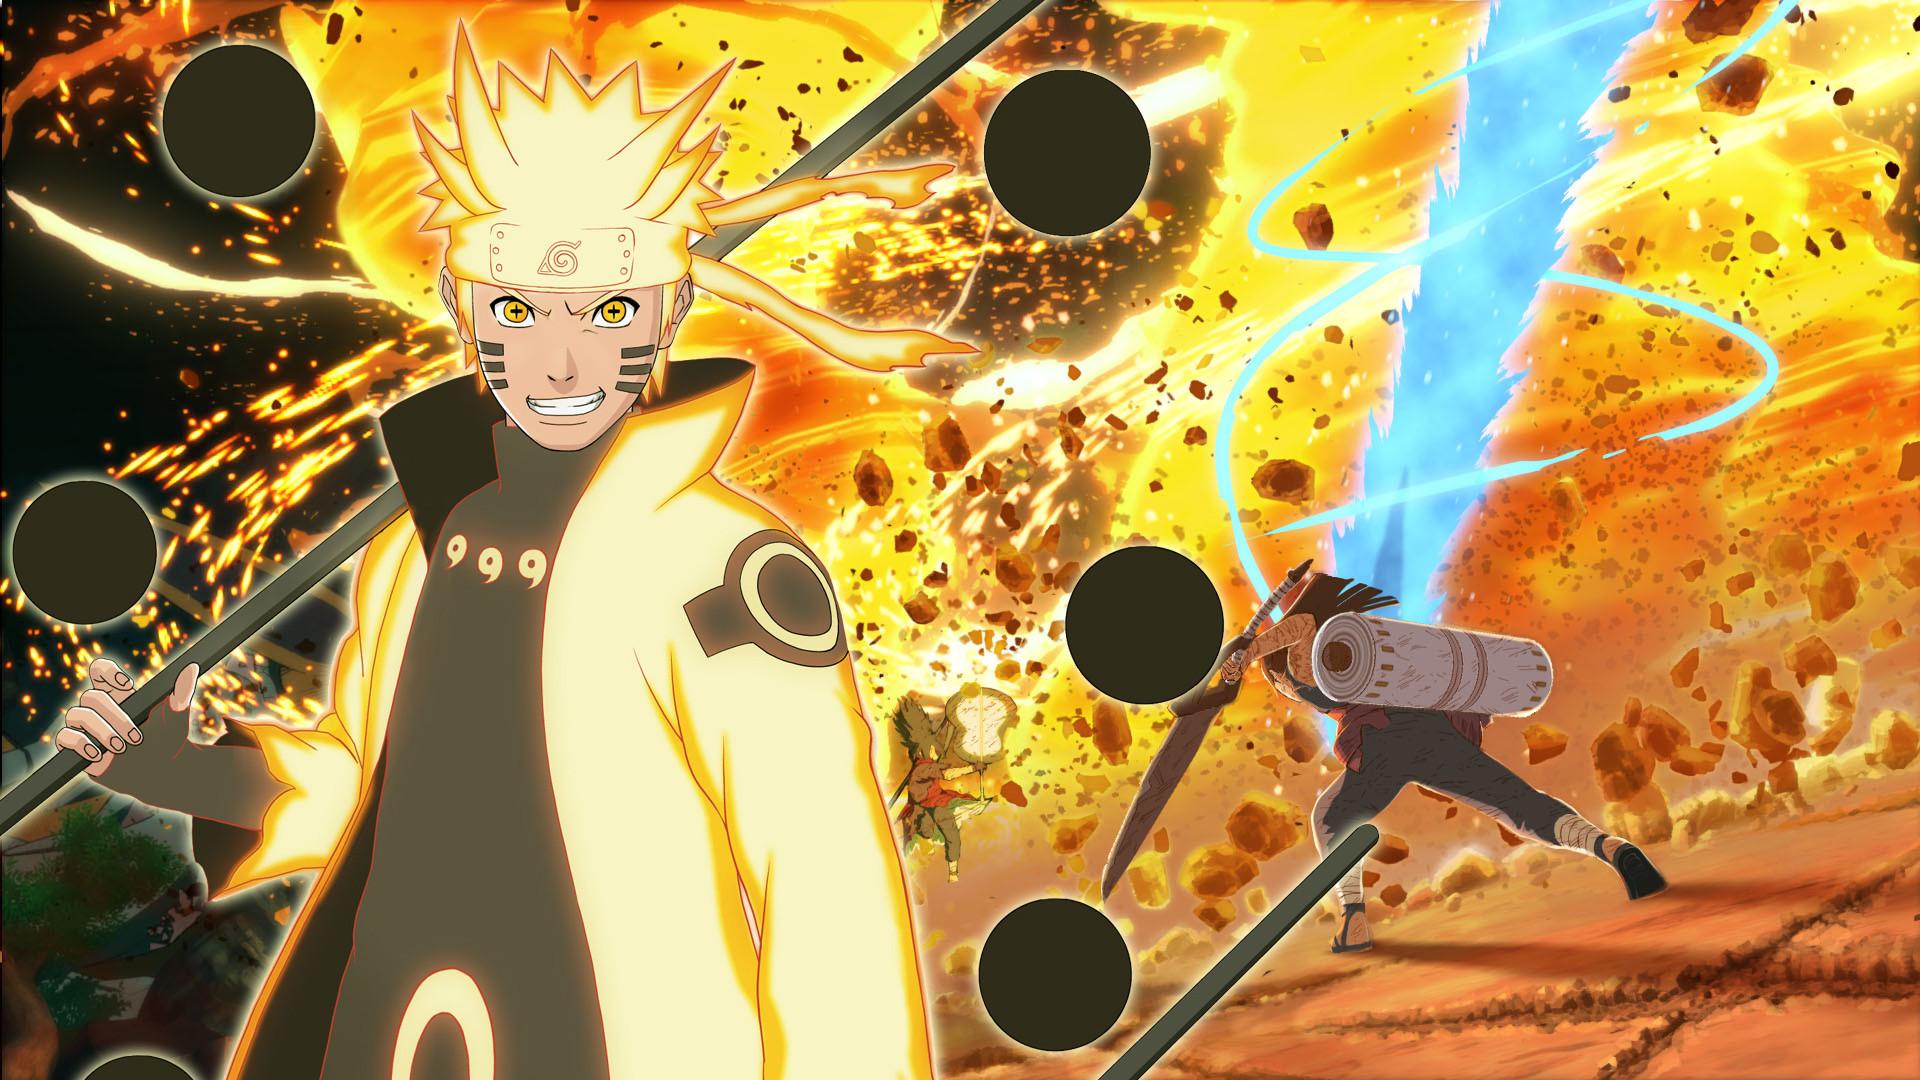 Naruto Shippuden Backgrounds Wallpapertag